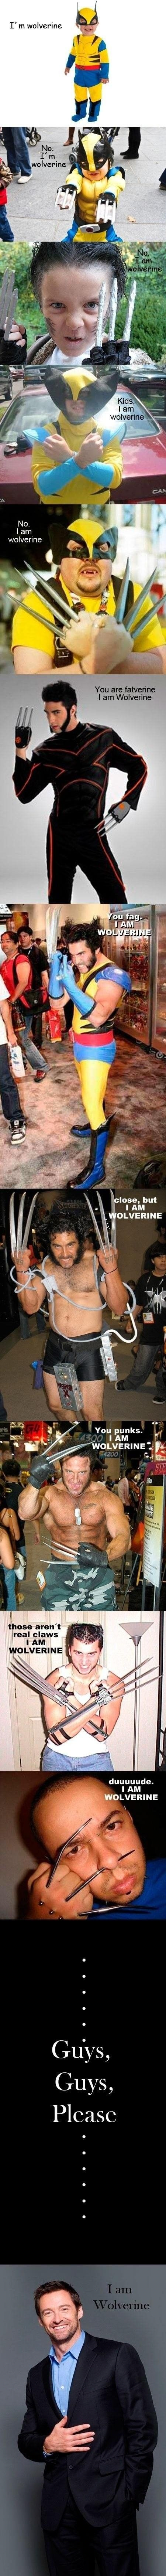 I Am Wolverine - The Wolverine Meme